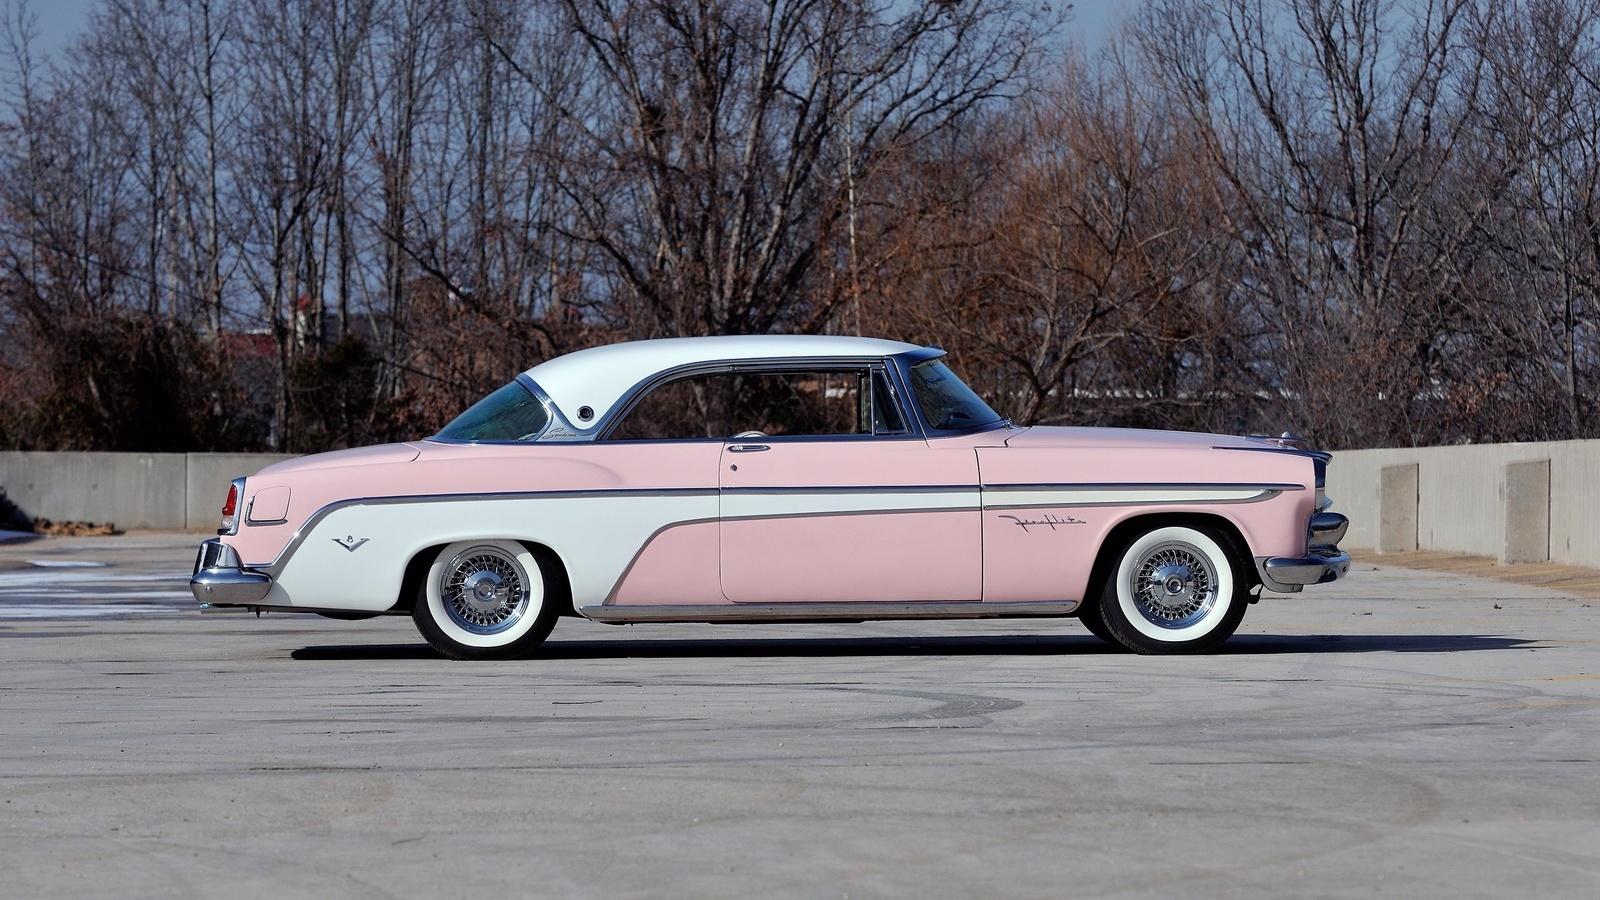 1955 desoto fireflite sportsman, desoto, auto, classic, авто, ретро, американская классика